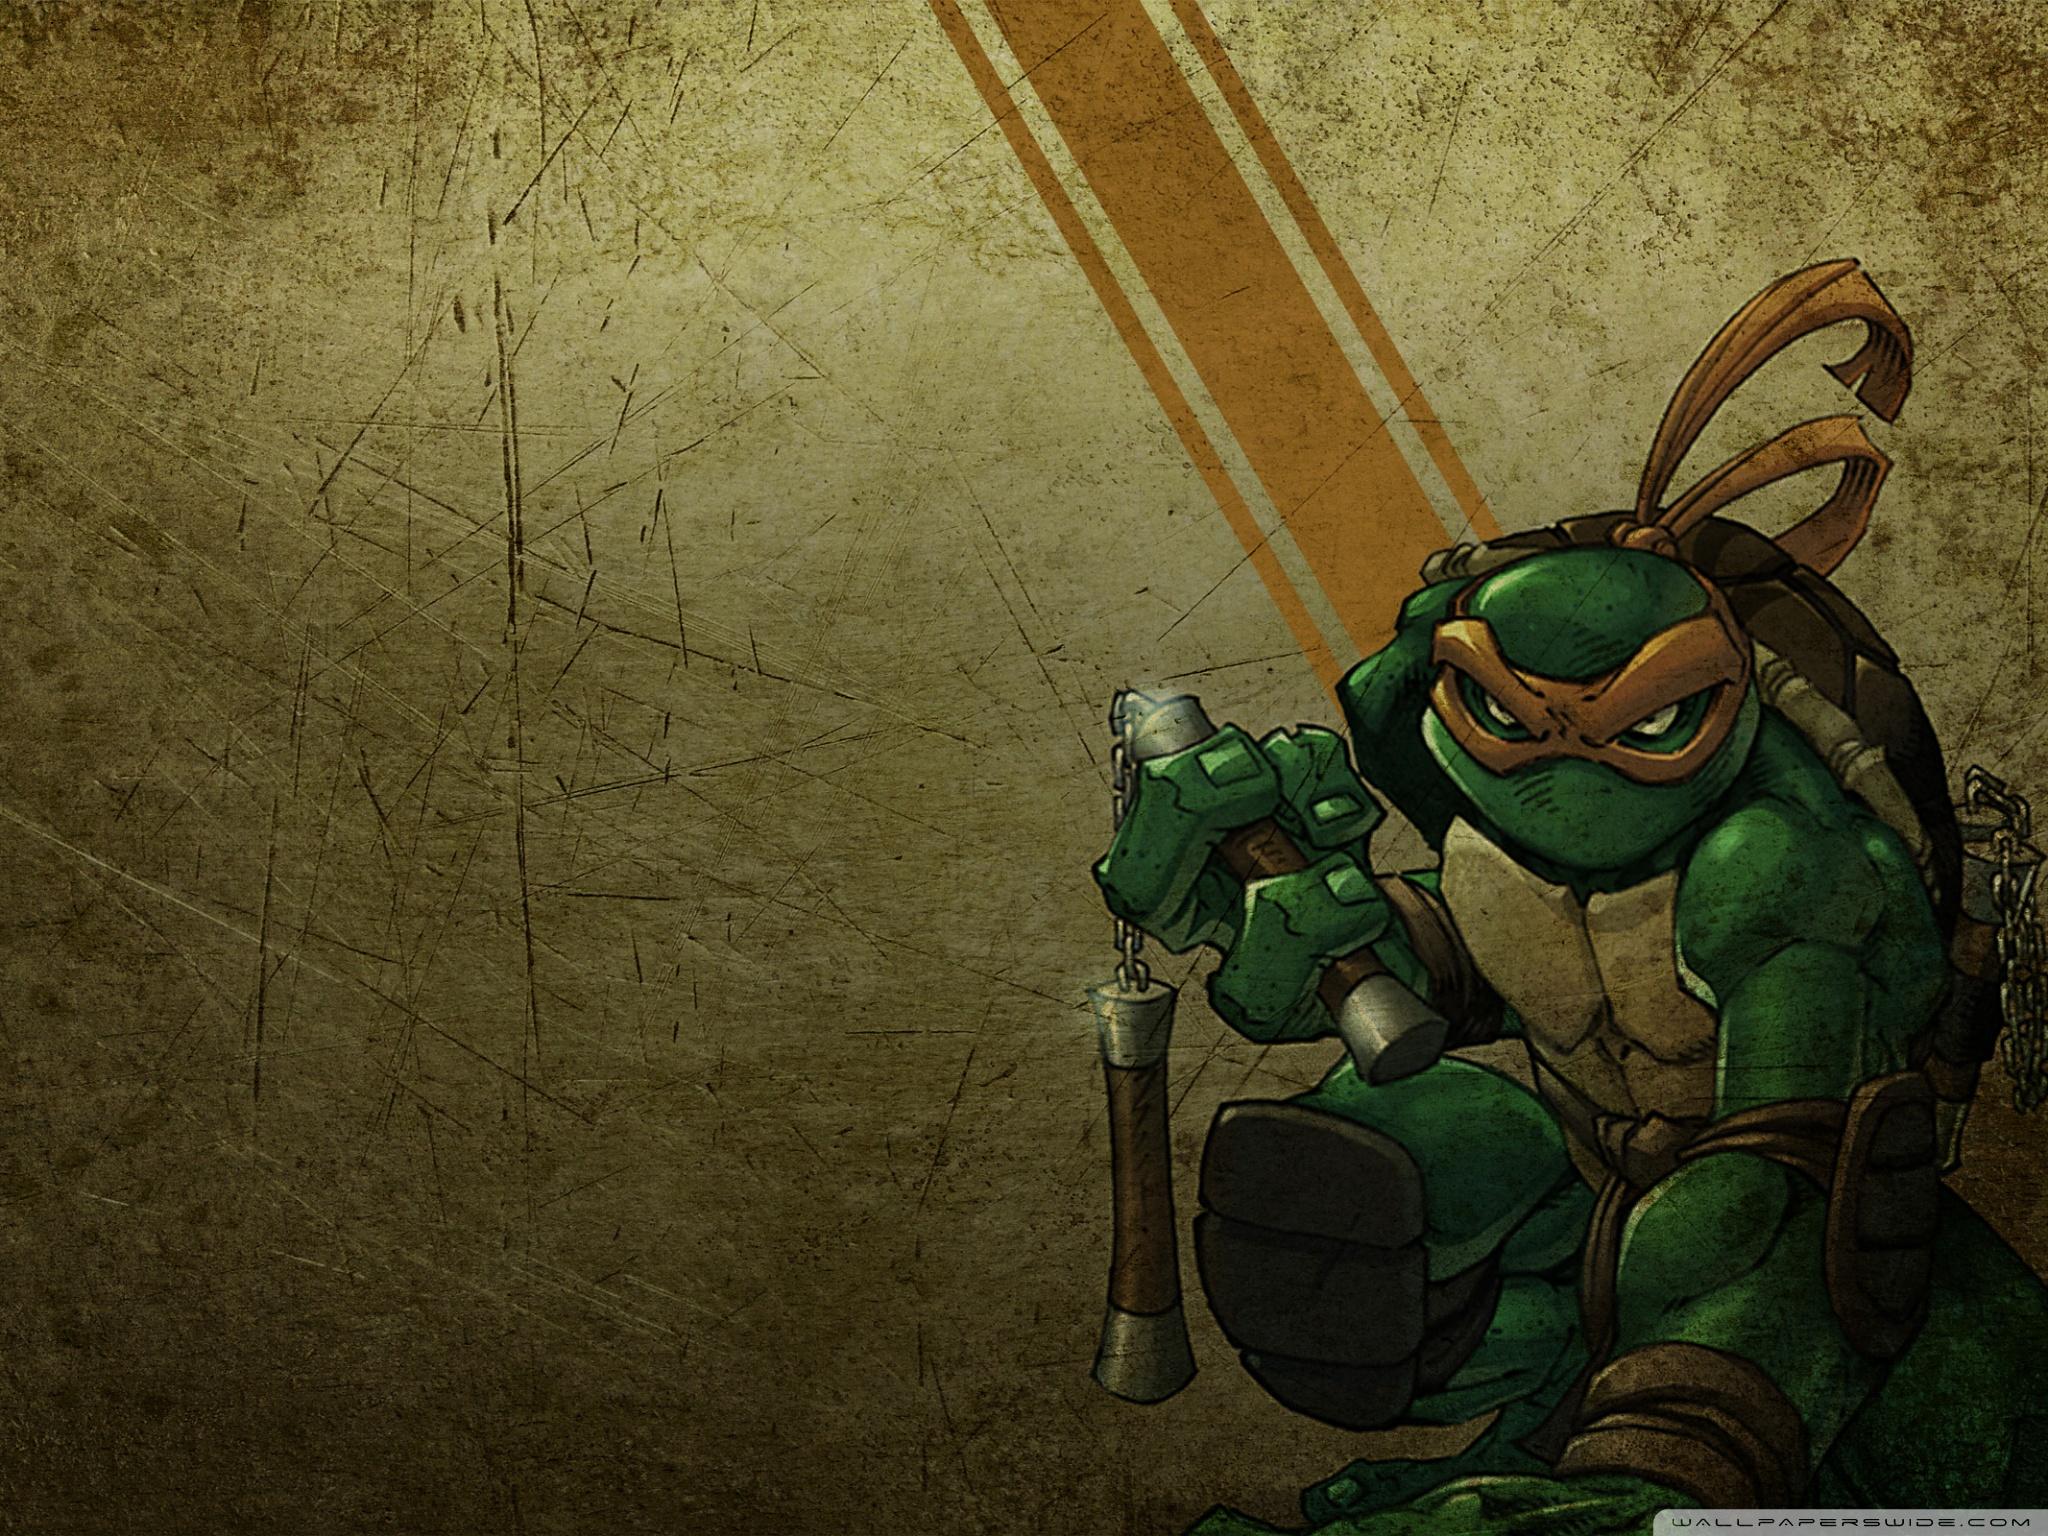 Ninja Turtles Wallpaper